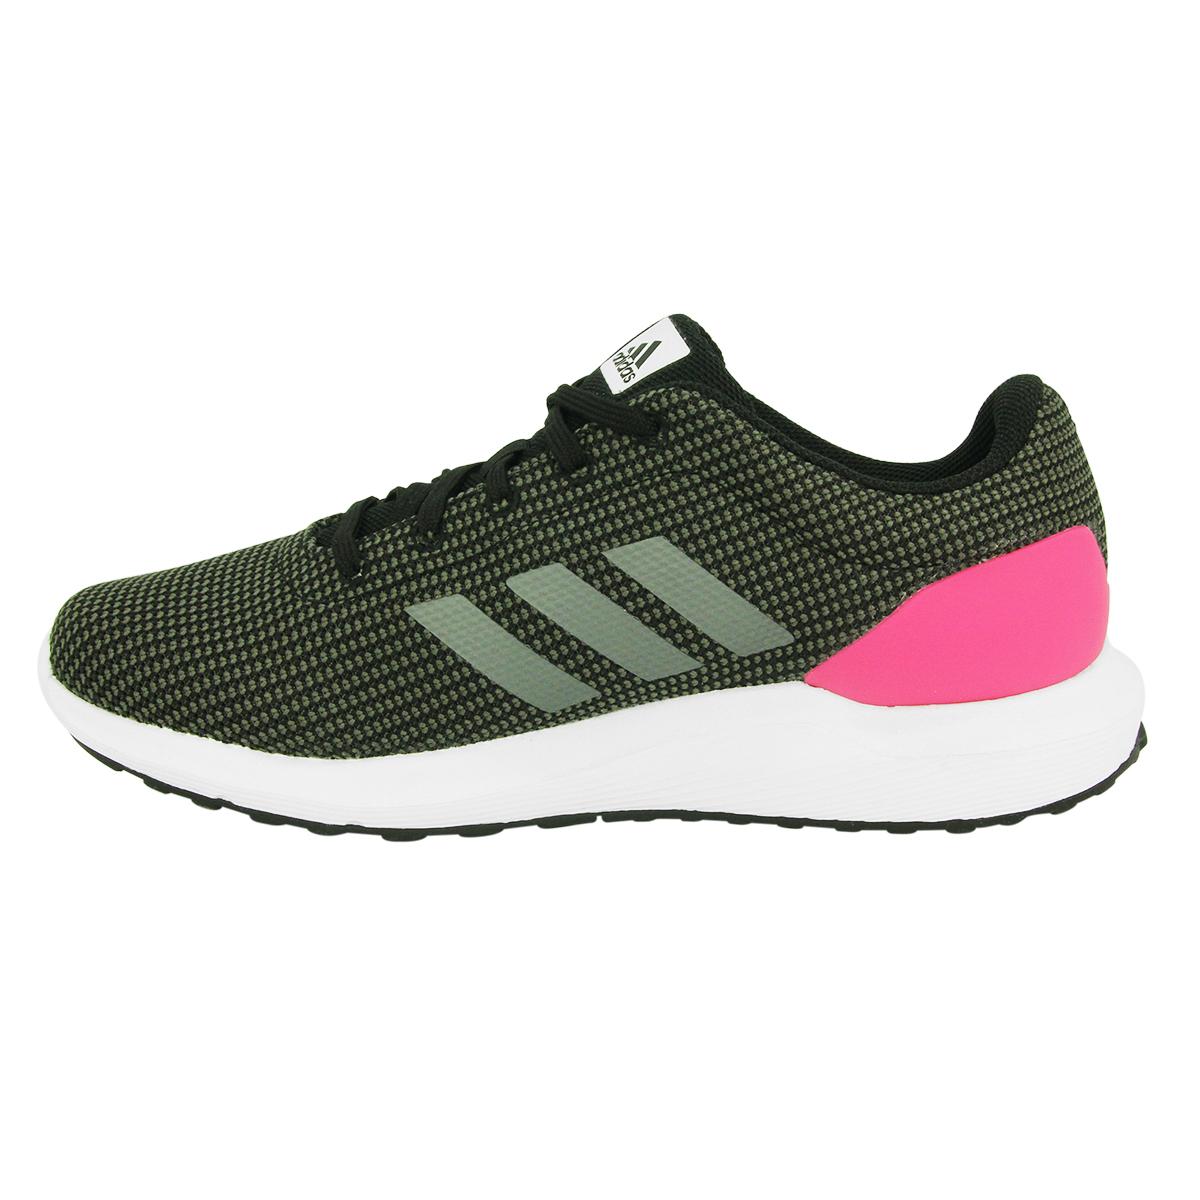 412c760abf ... 2 sur 6 Adidas Performance COSMIC WOMEN CLOUDFOAM Chaussures Running  Femme 3 Adidas Performance COSMIC WOMEN CLOUDFOAM Chaussures Running Femme  3 3 sur ...